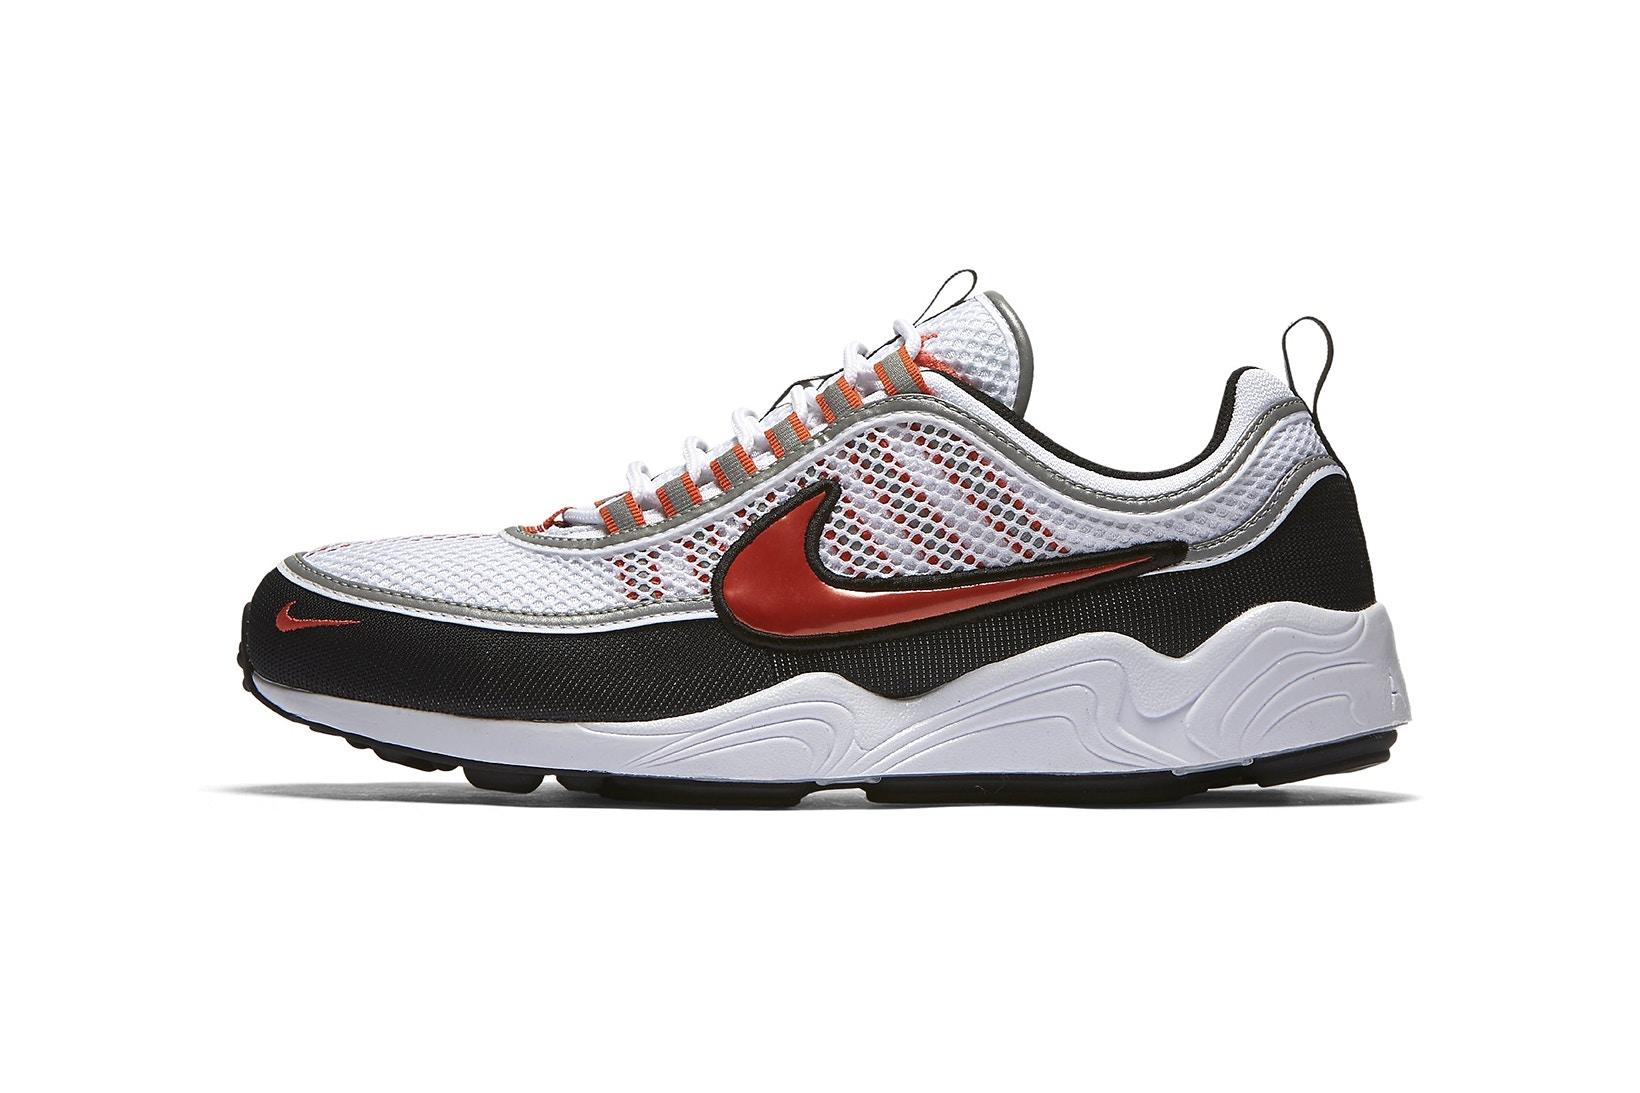 La Nike Air Zoom Spiridon revient en